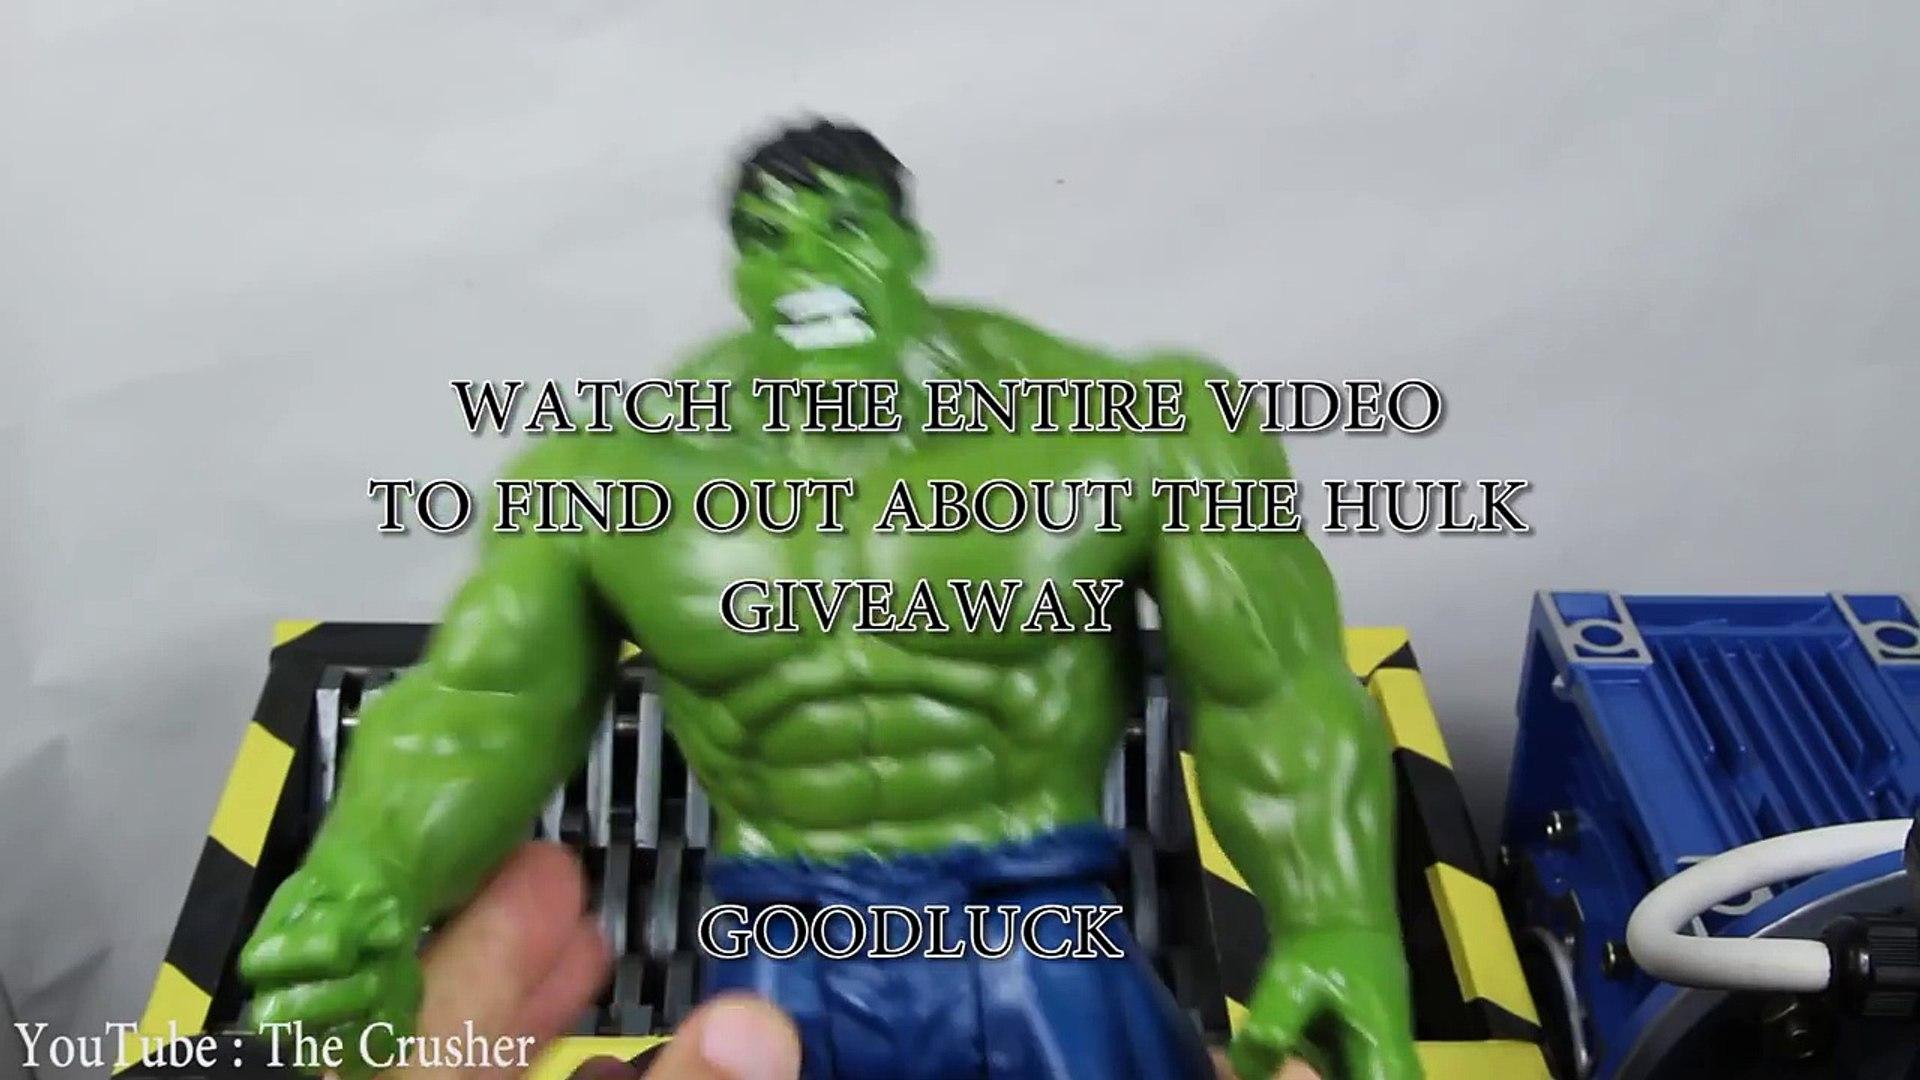 Experiment Shredding Avengers HULK And Toys | The Crusher